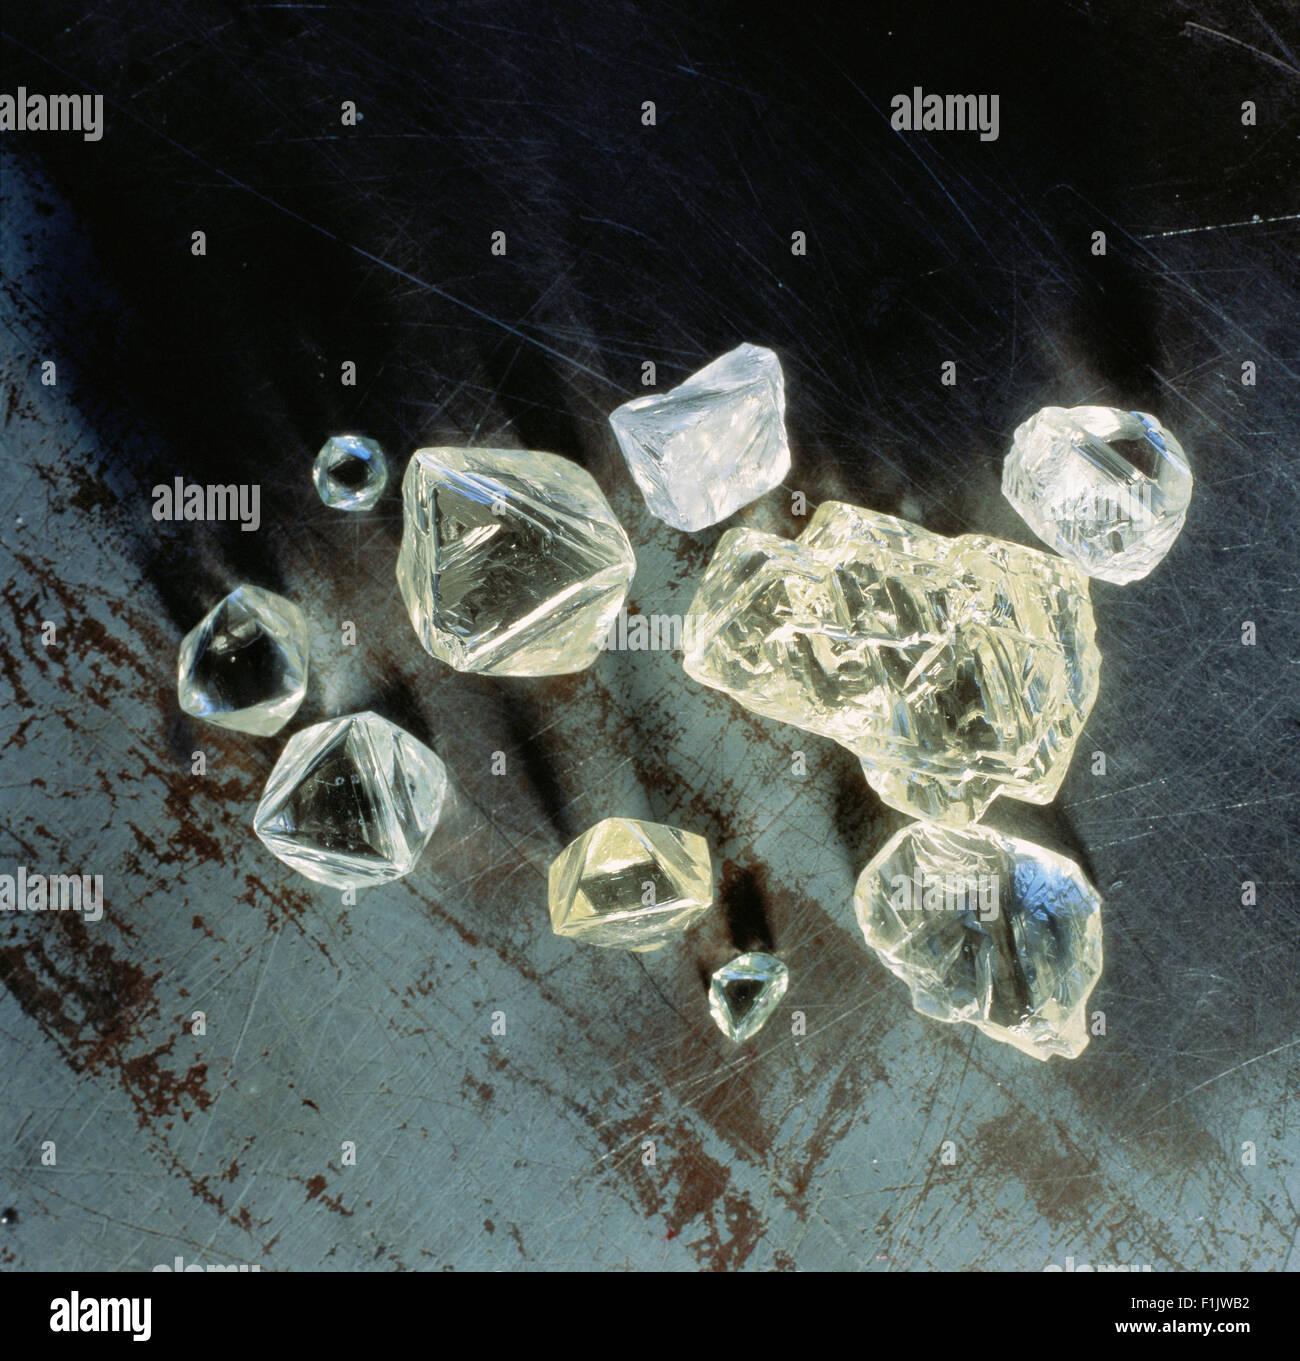 Uncut Diamonds - Stock Image